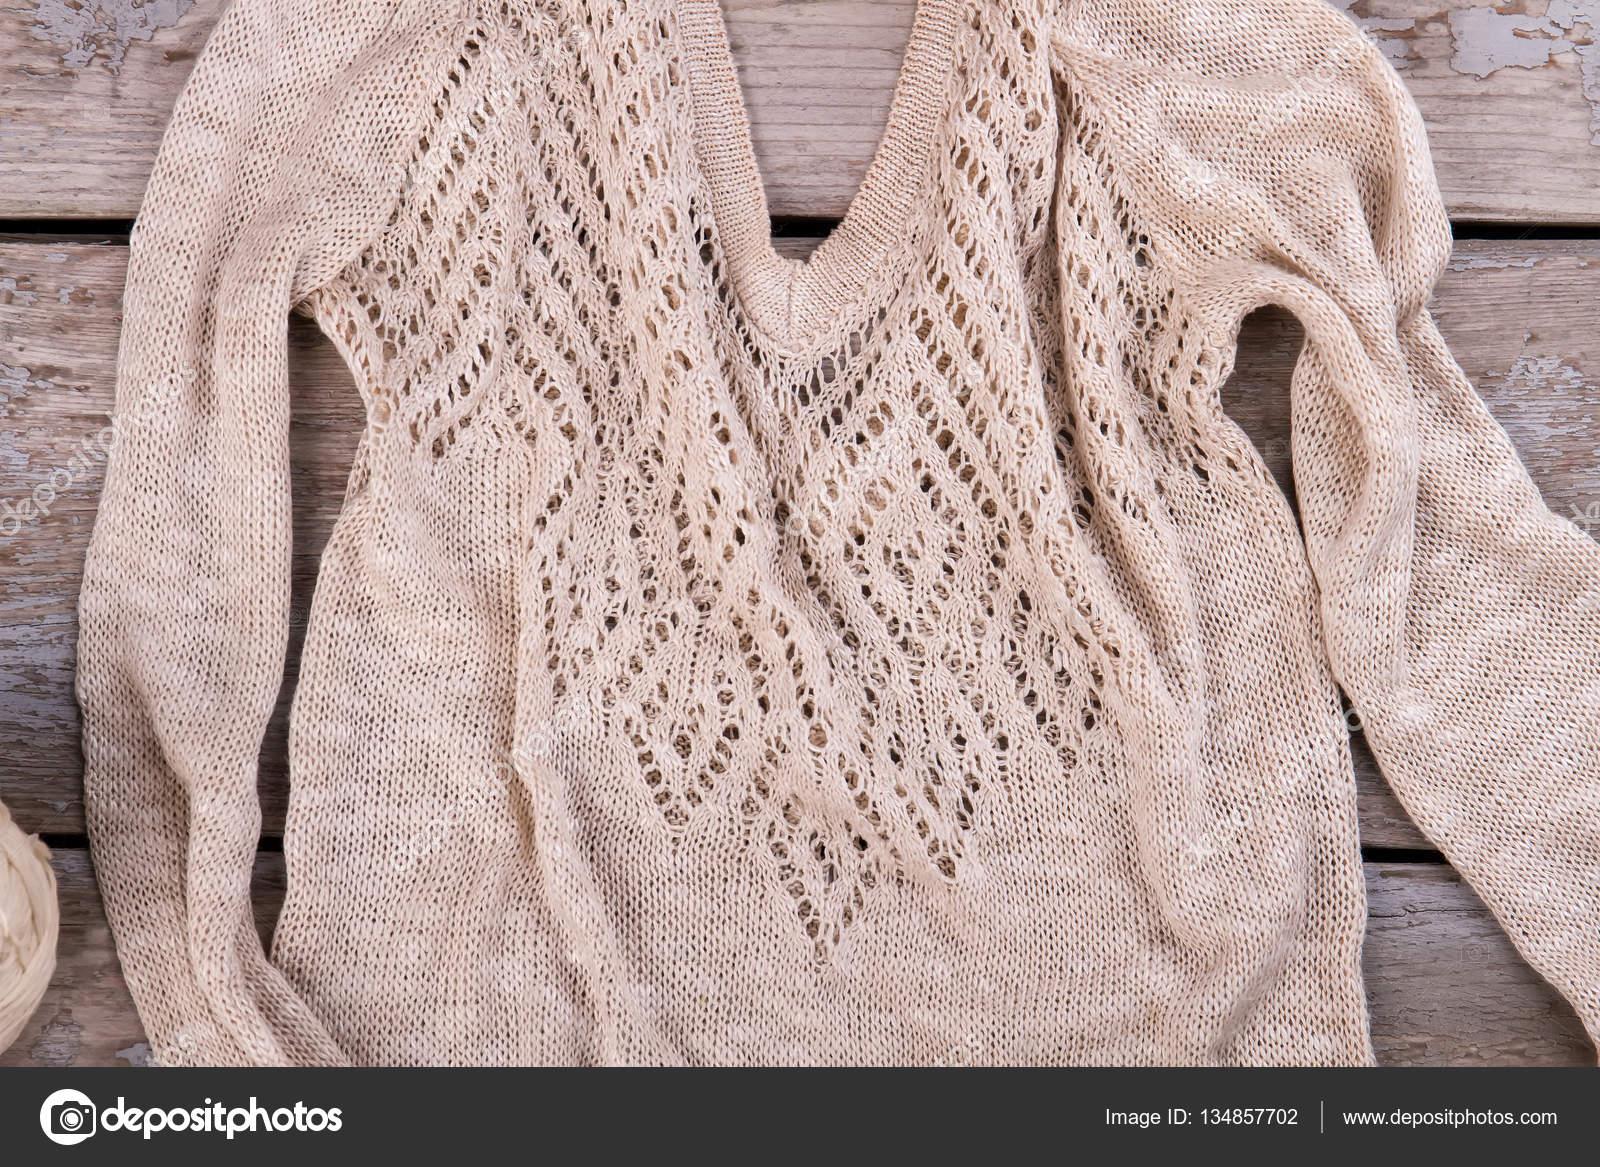 d2b5bf0656b8 Όμορφη πλεκτή μπλούζα με γιακά διάτρητο — Φωτογραφία Αρχείου ...